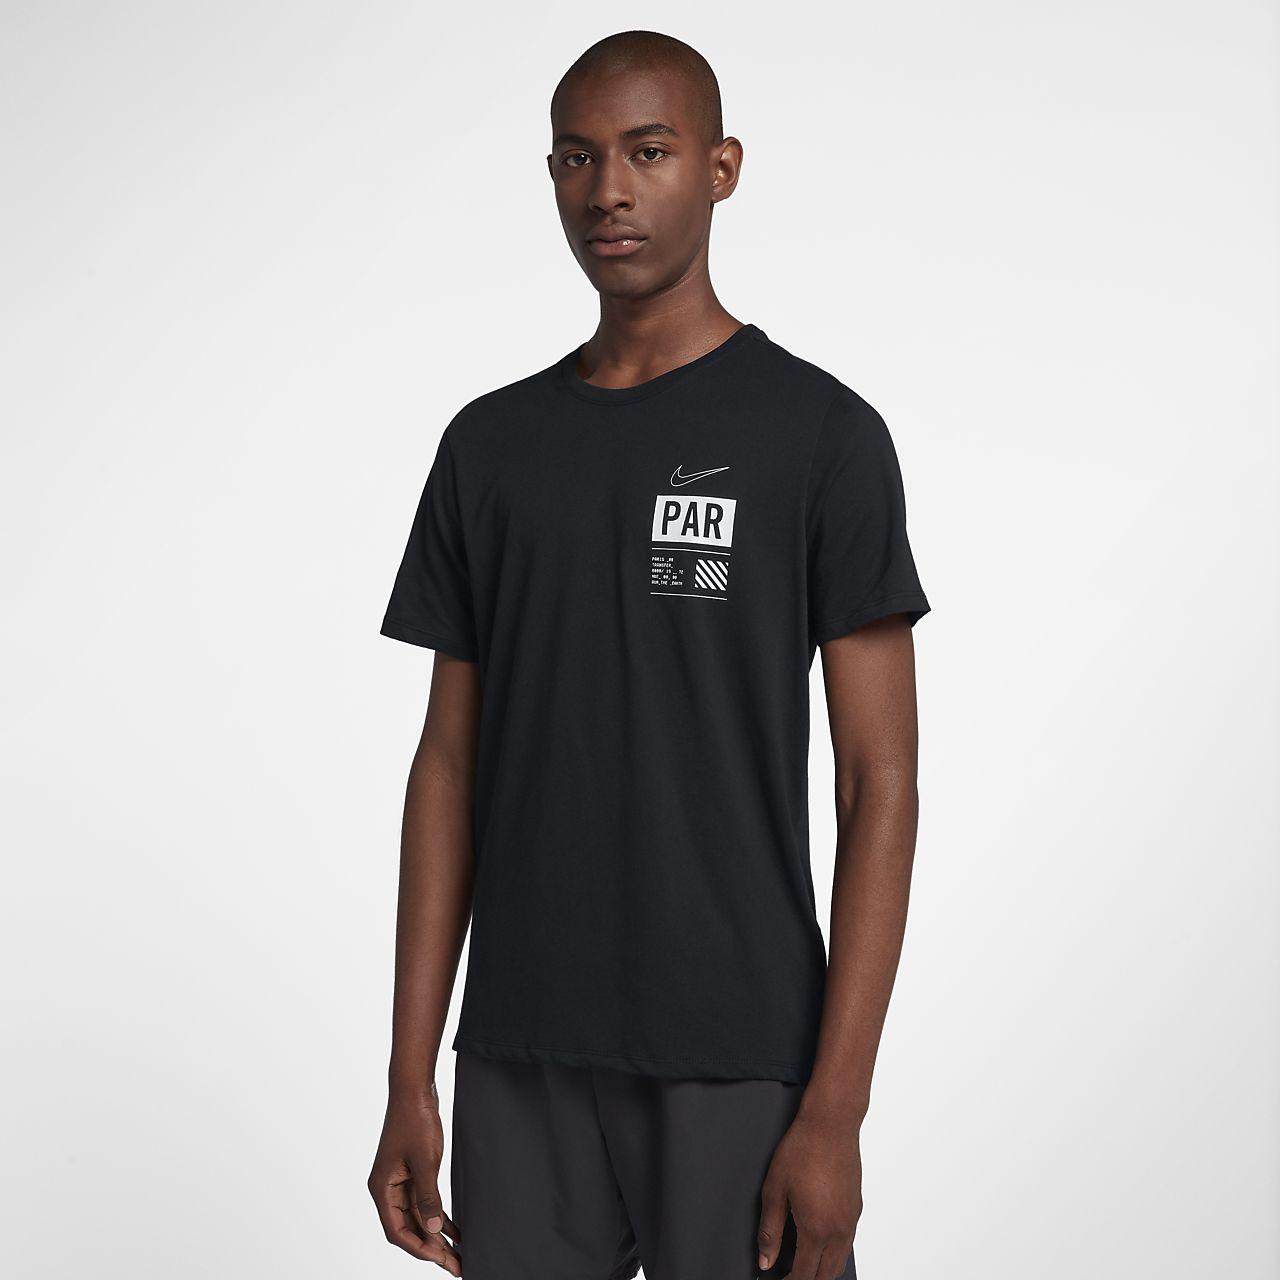 dc227eda98aba6 Nike Dri-FIT (Paris) Men s Running T-Shirt. Nike.com AU